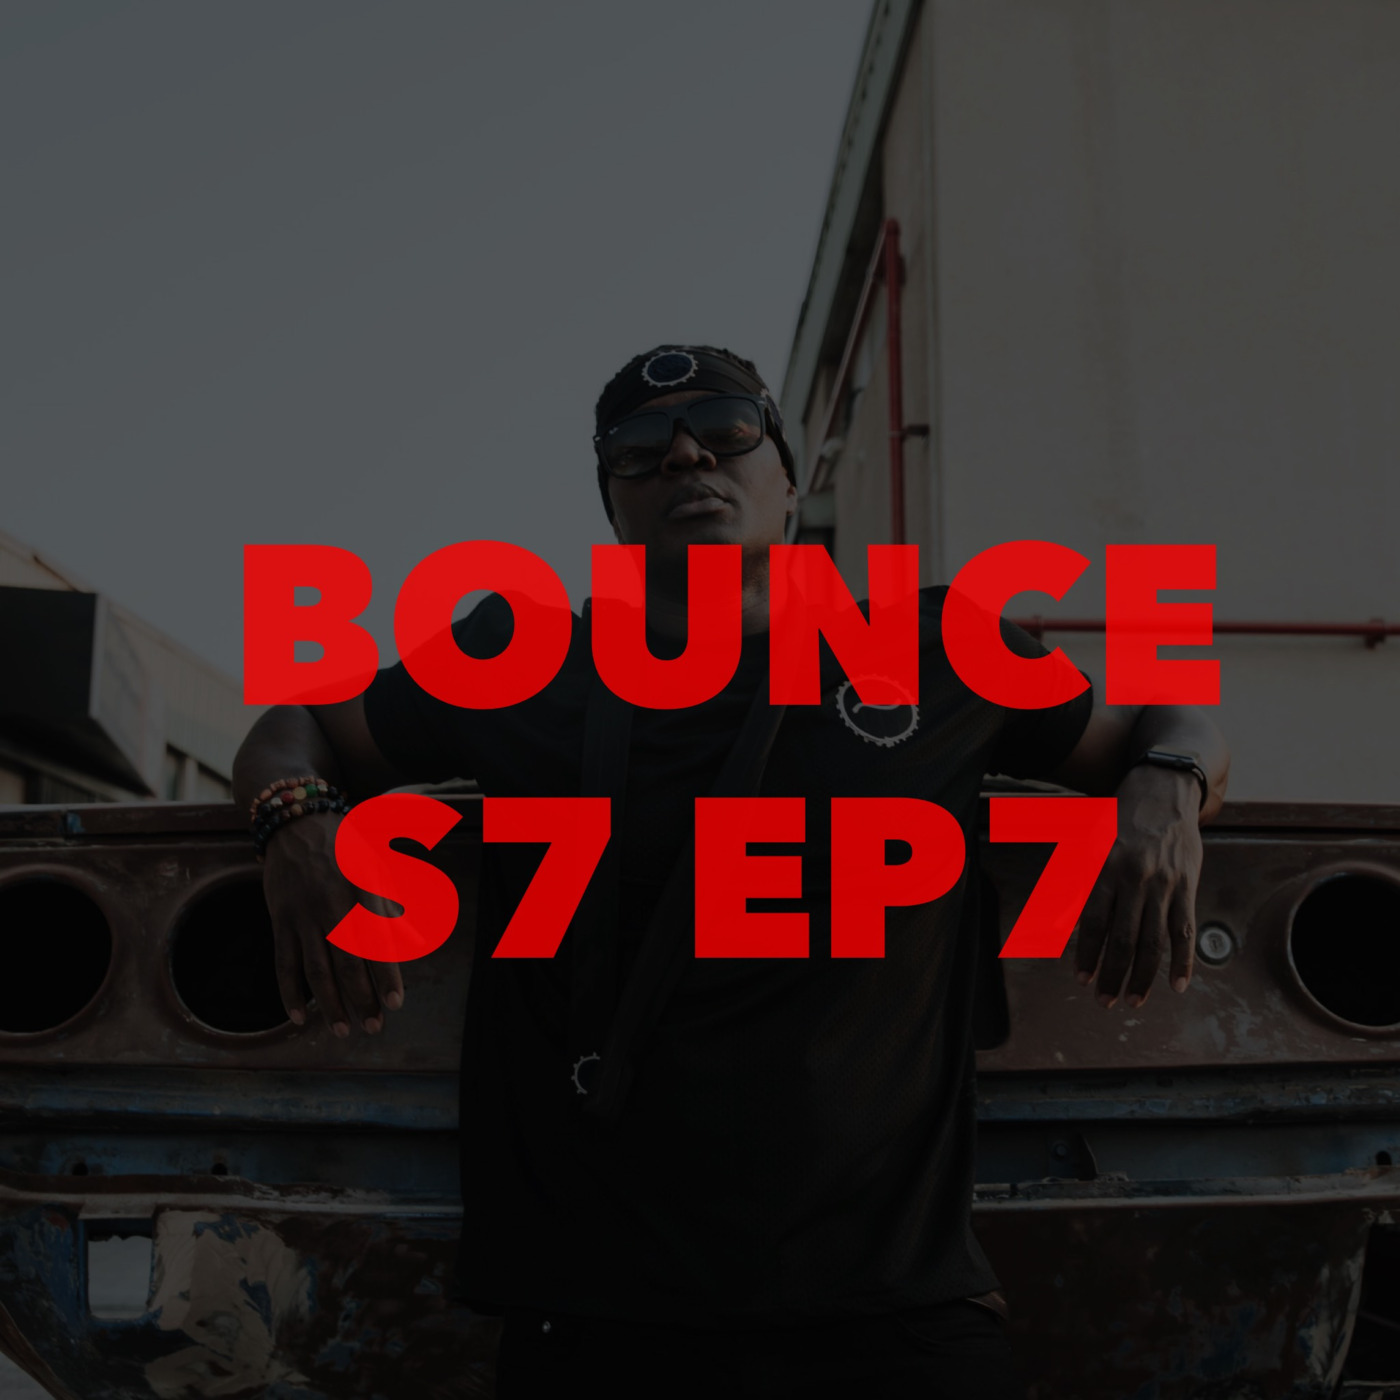 BOUNCE S7 EP7 Dj Crown Prince podcast